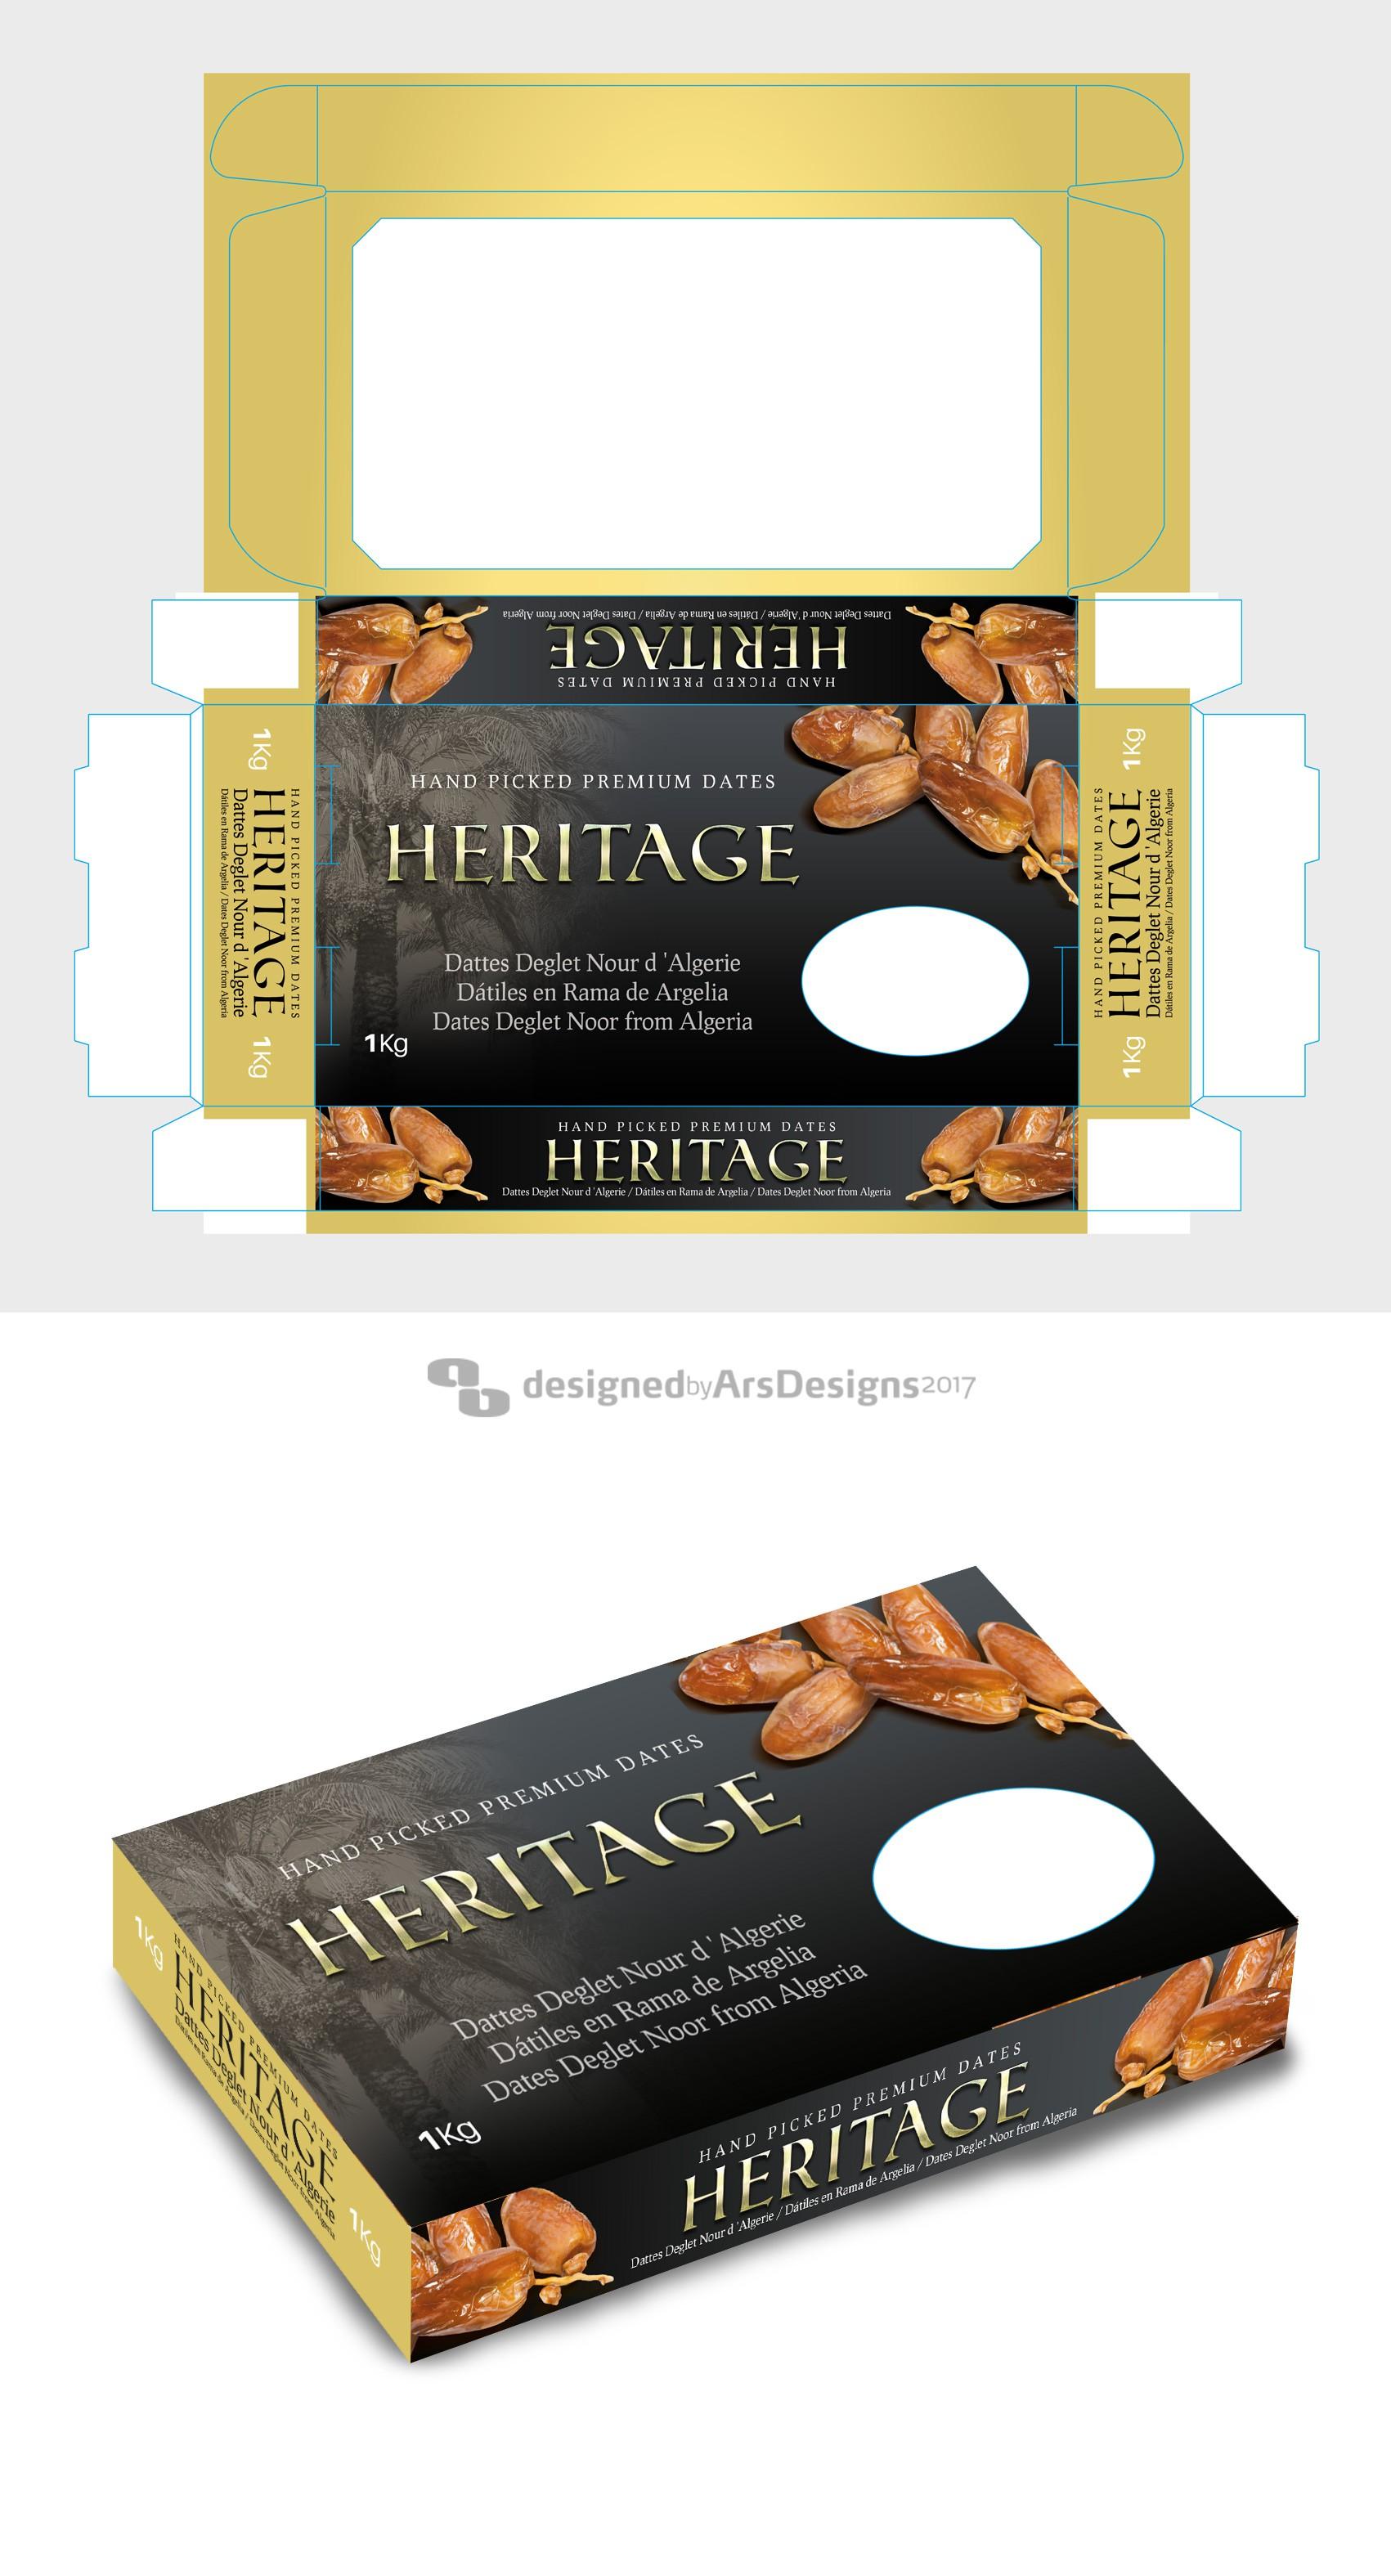 Splendid carton box design for dried dates.